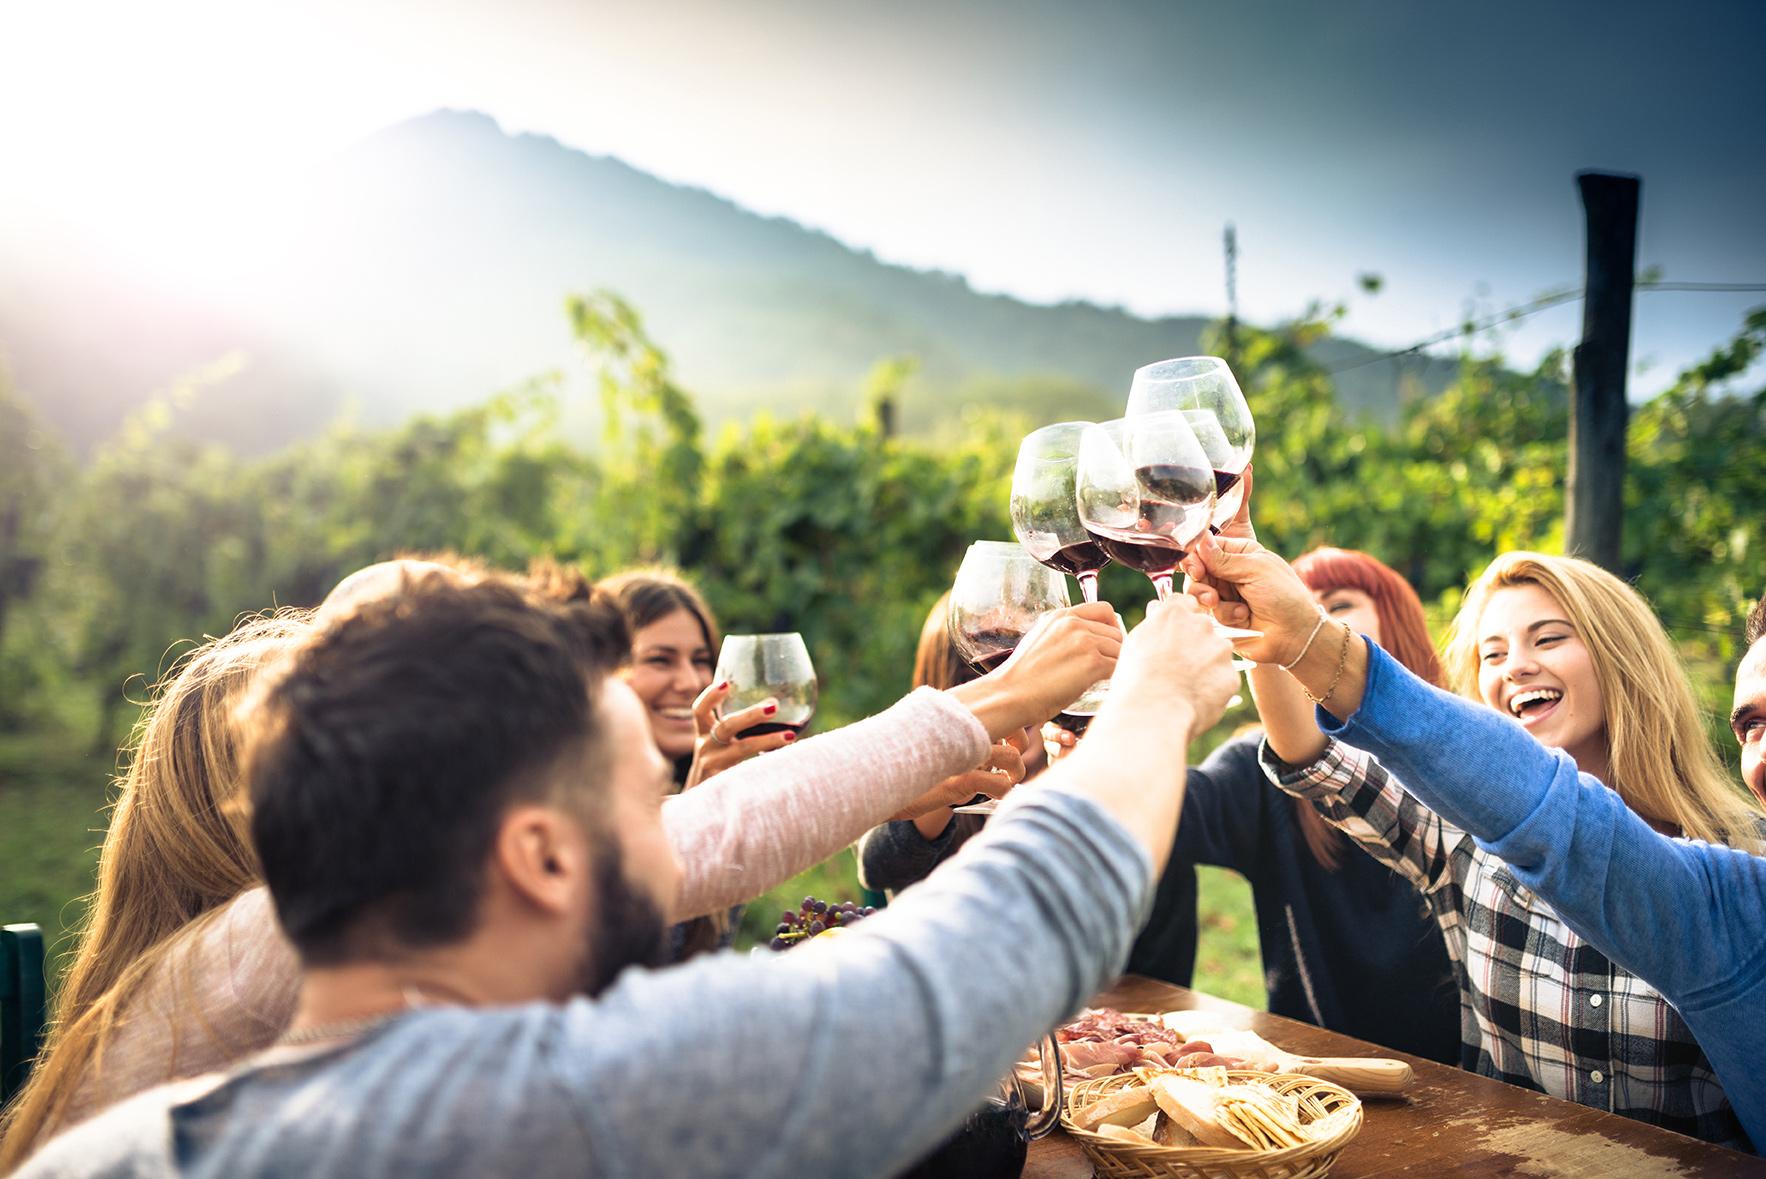 Group-Wine-Tours-Australia-72dpi.jpg